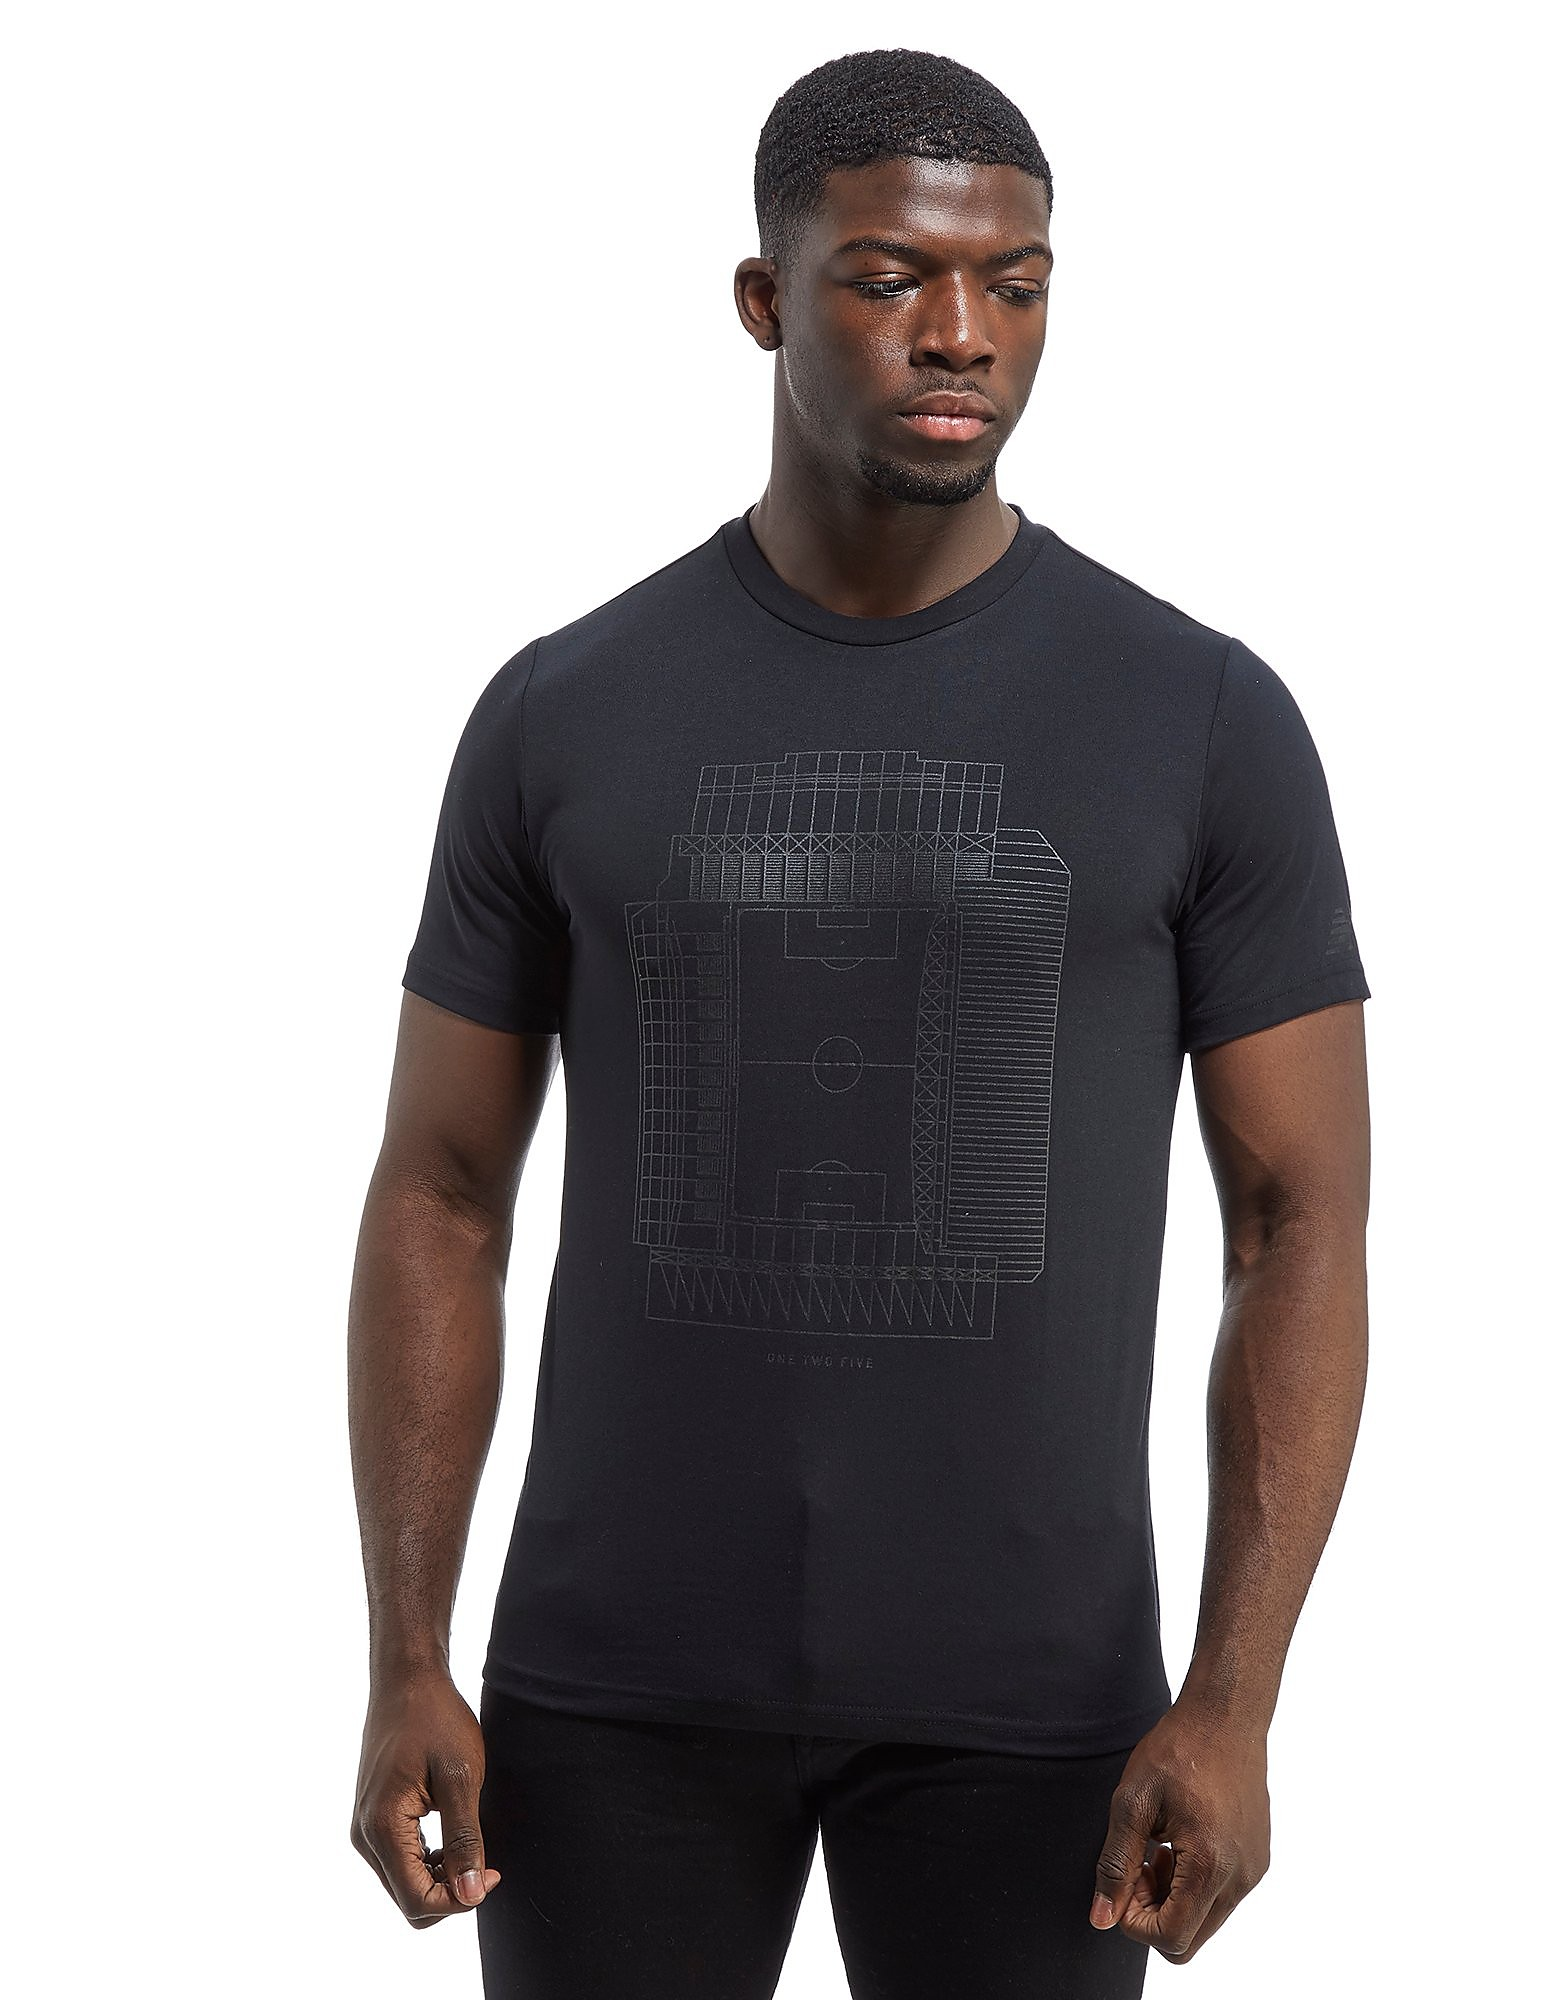 New Balance 247 Liverpool FC Spielfeld T-Shirt